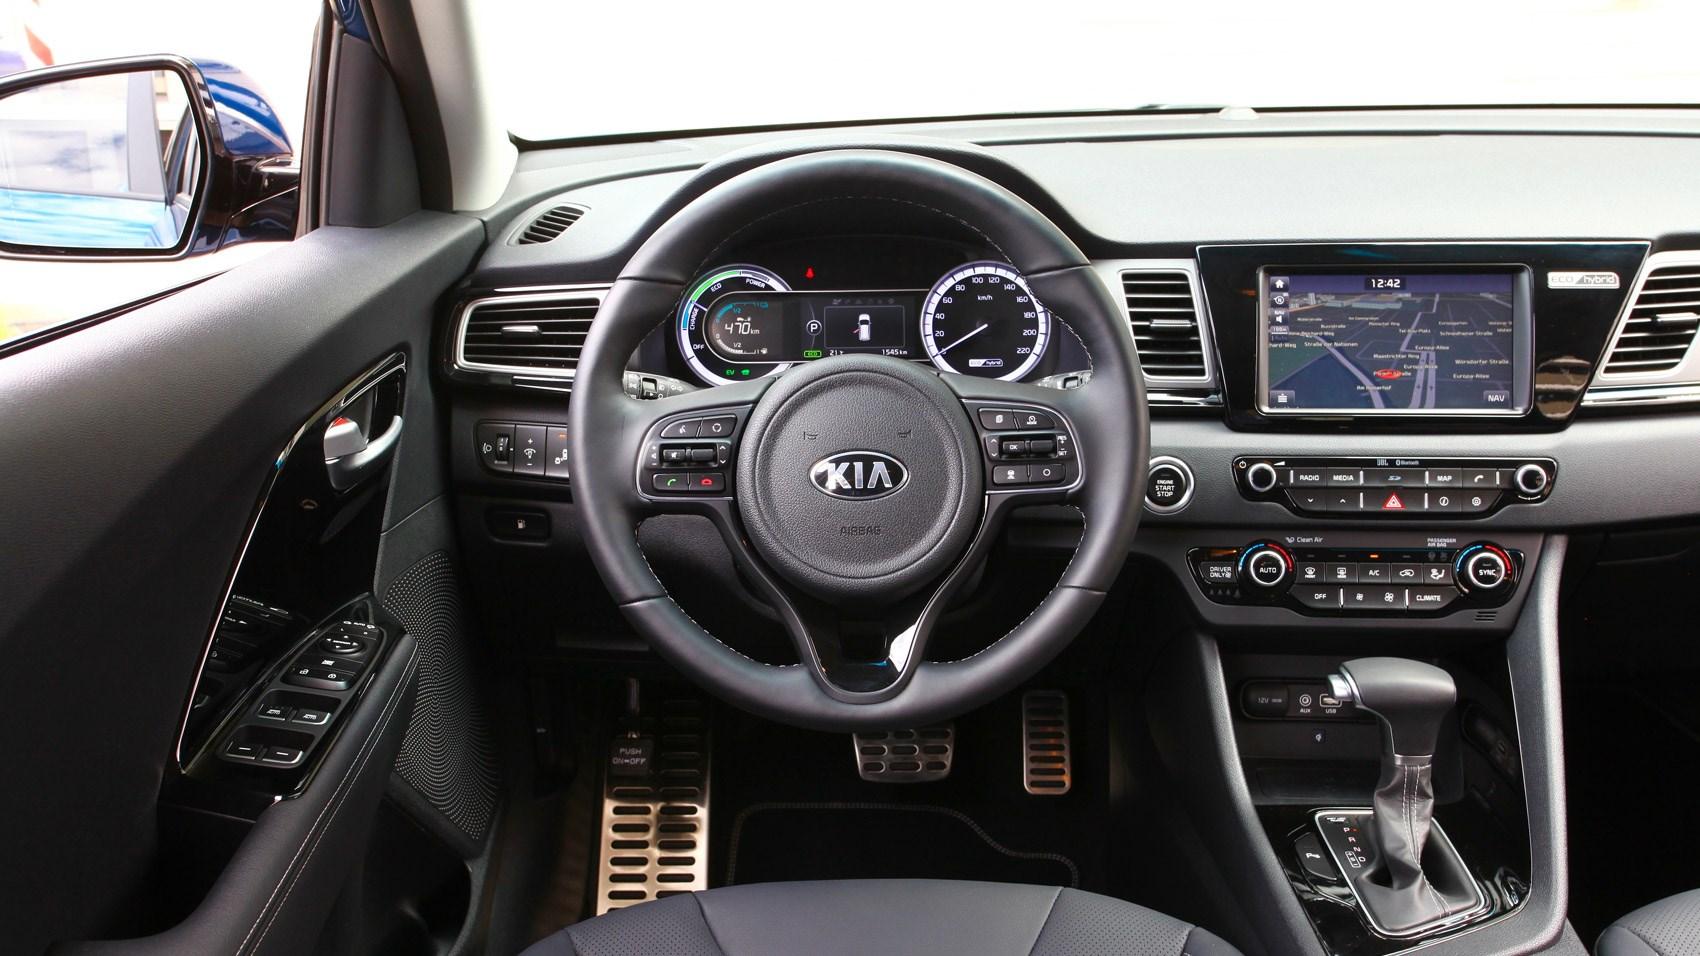 Kia Niro Lease >> Kia Niro (2016) review by CAR Magazine